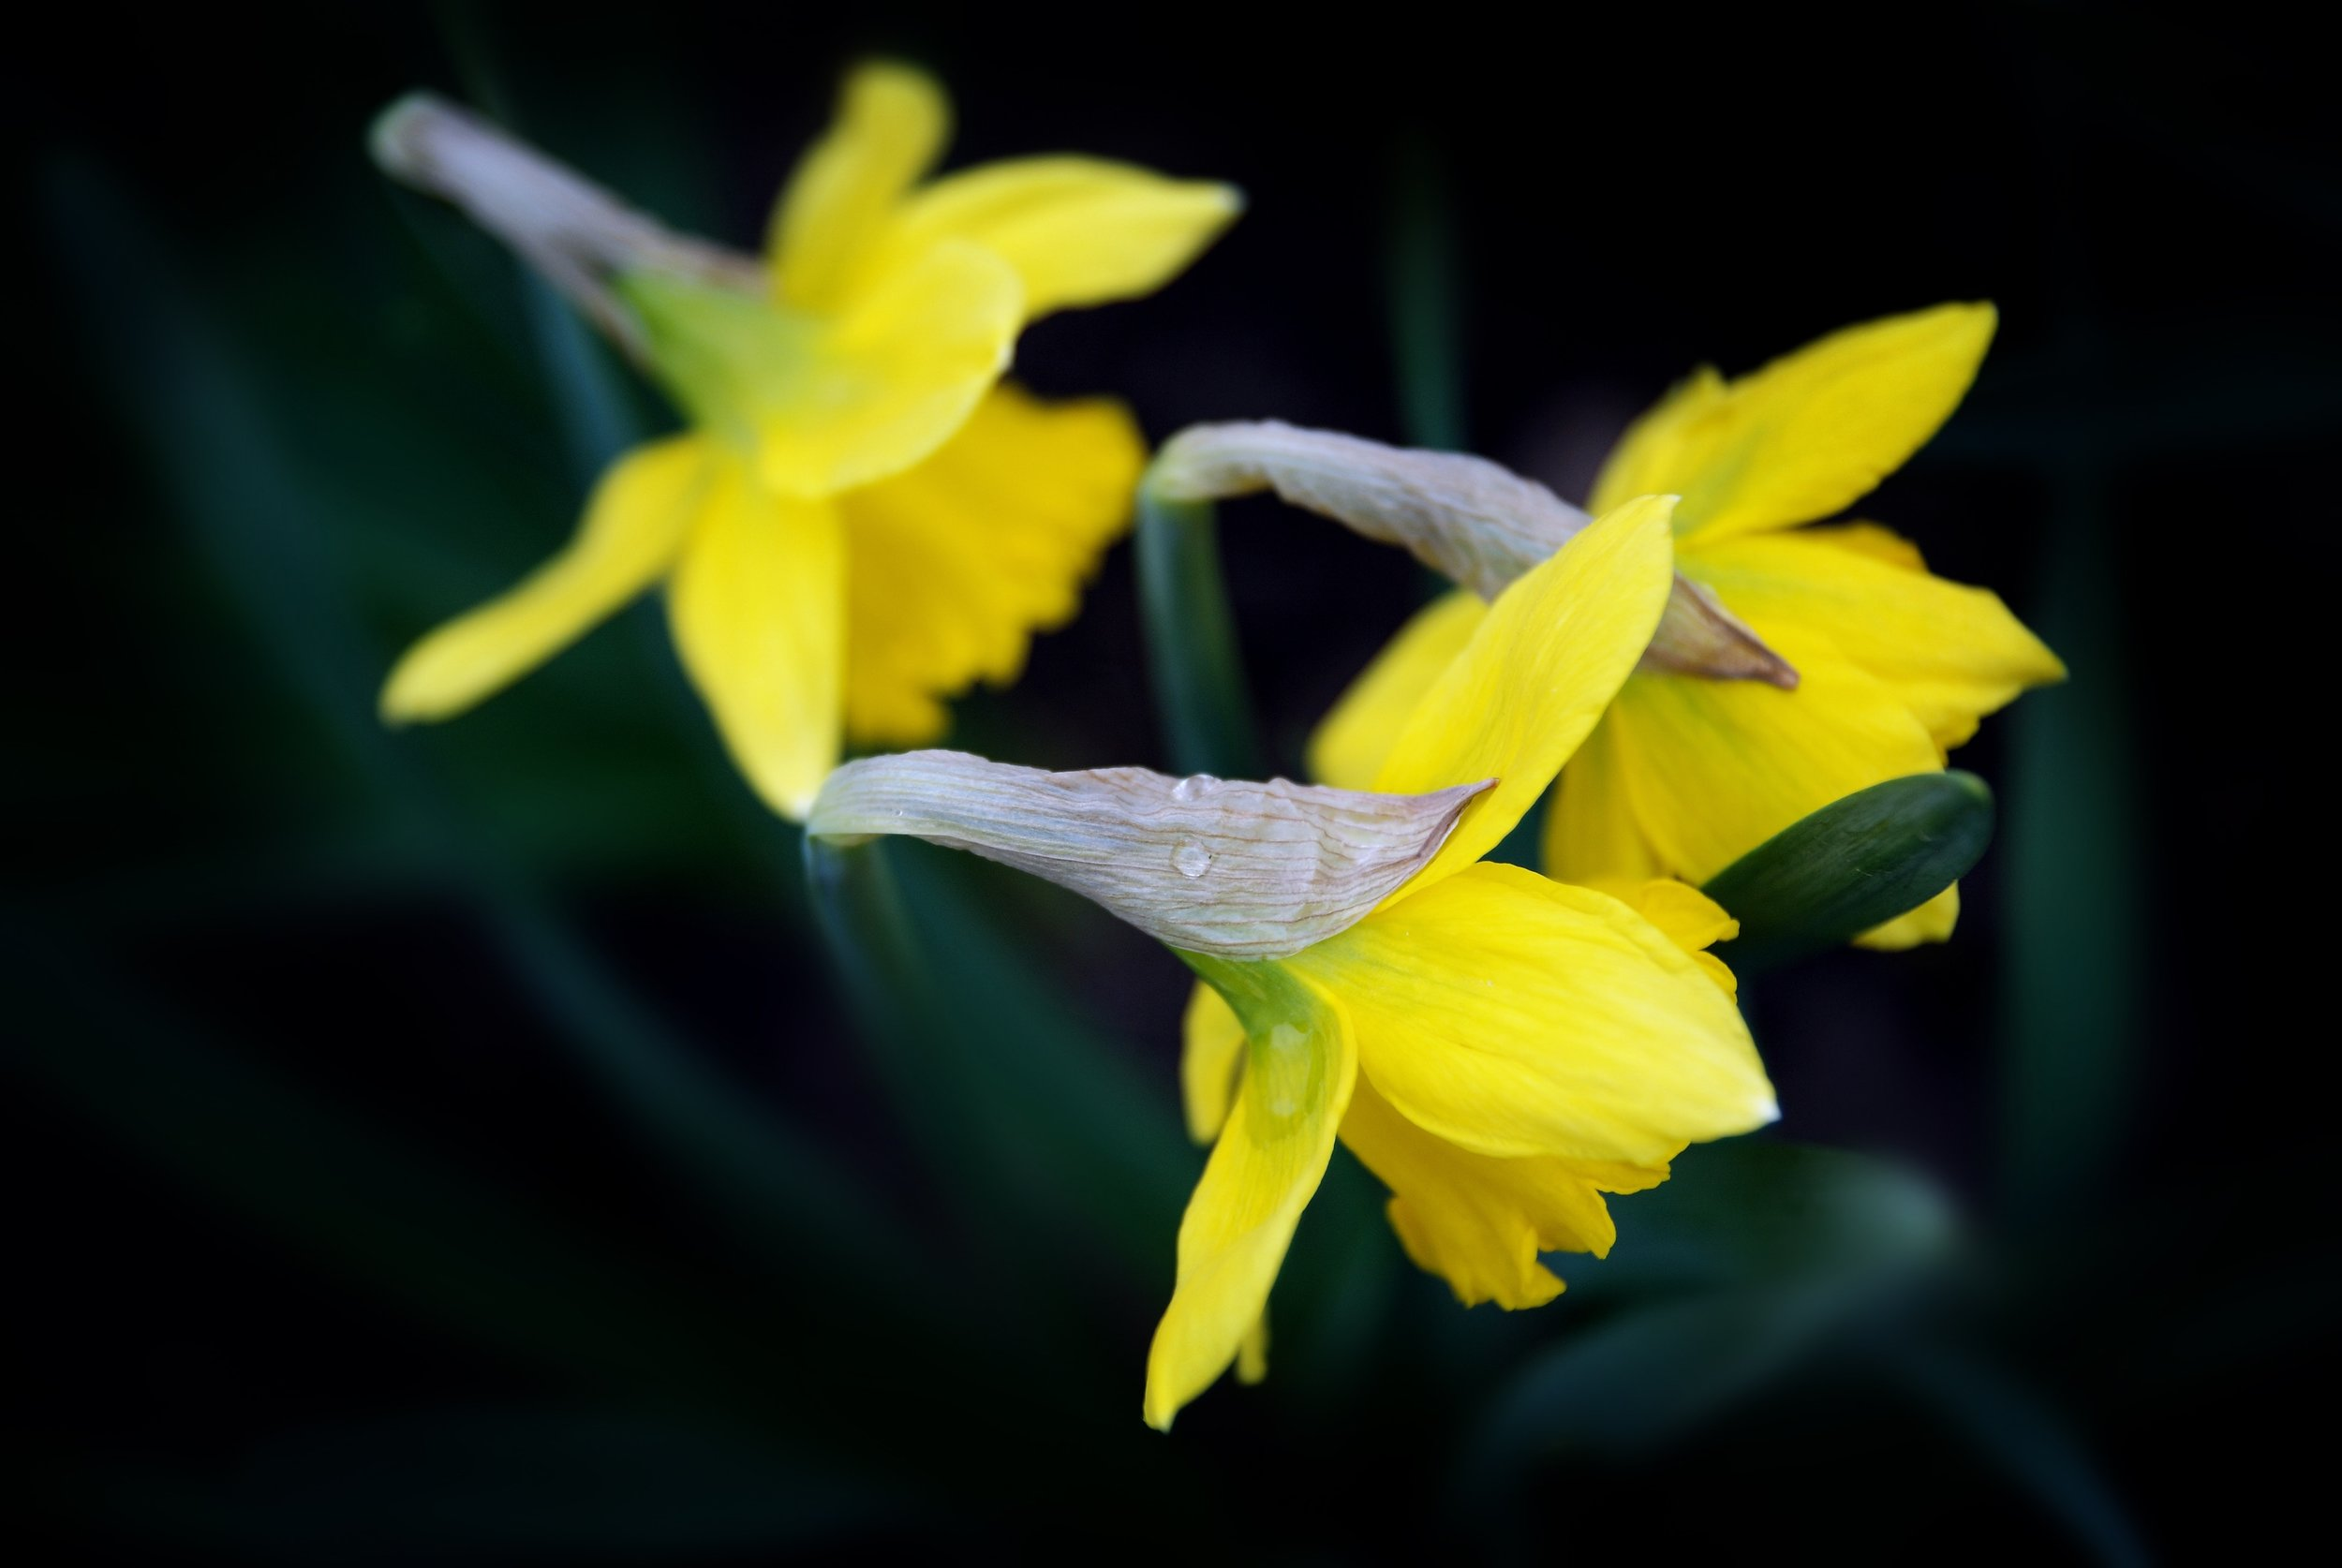 Daffodils in bloom.